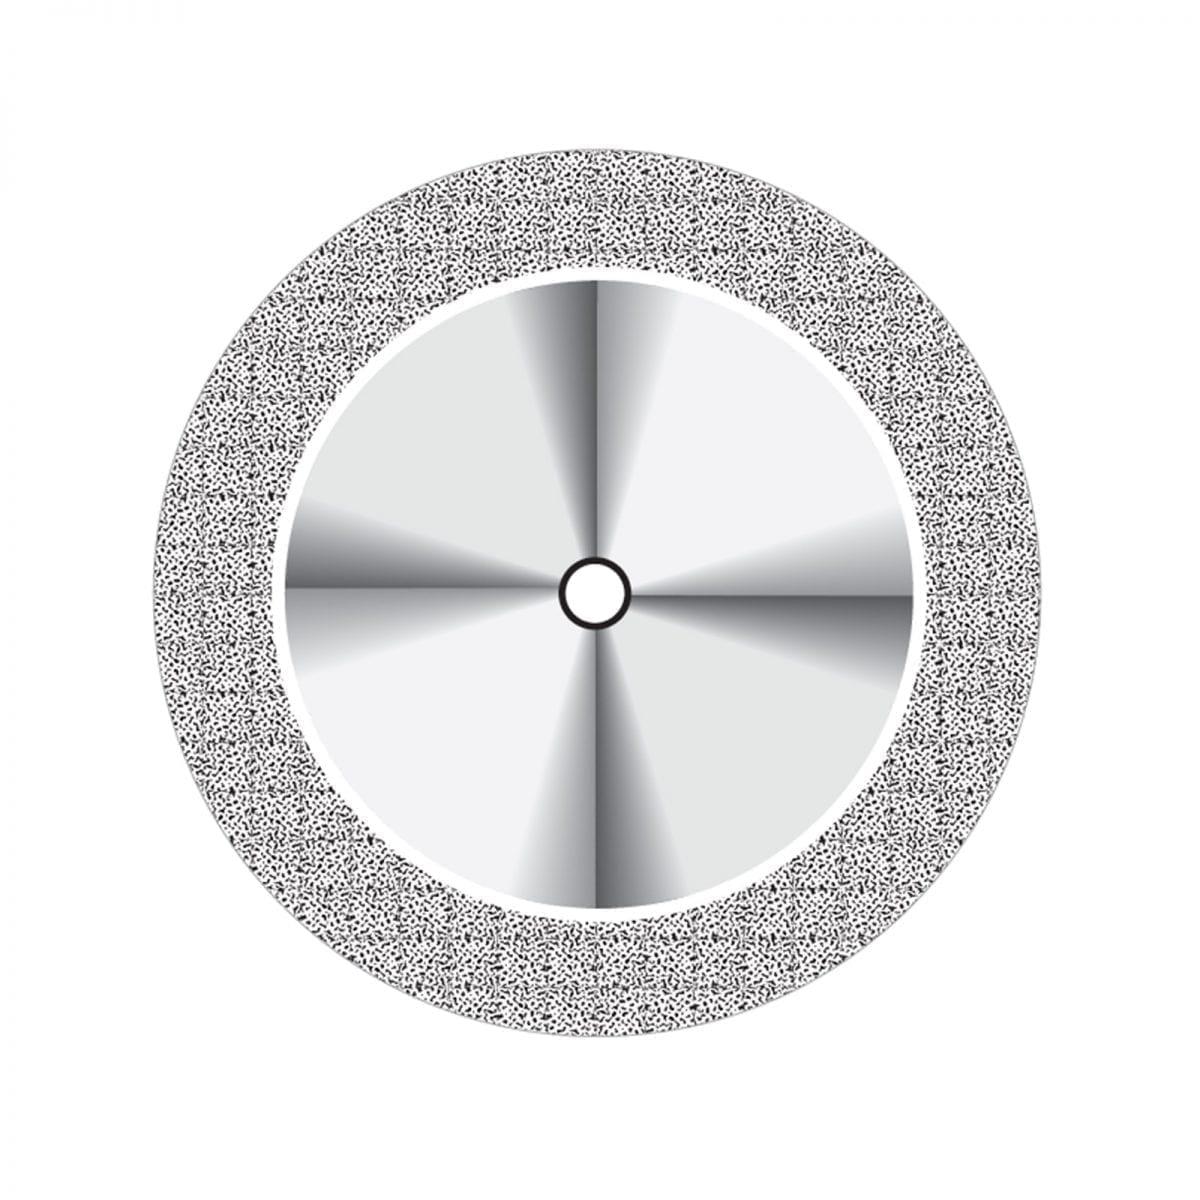 357-SuperFlex Single Sided - Strauss Diamond Instruments, Inc.